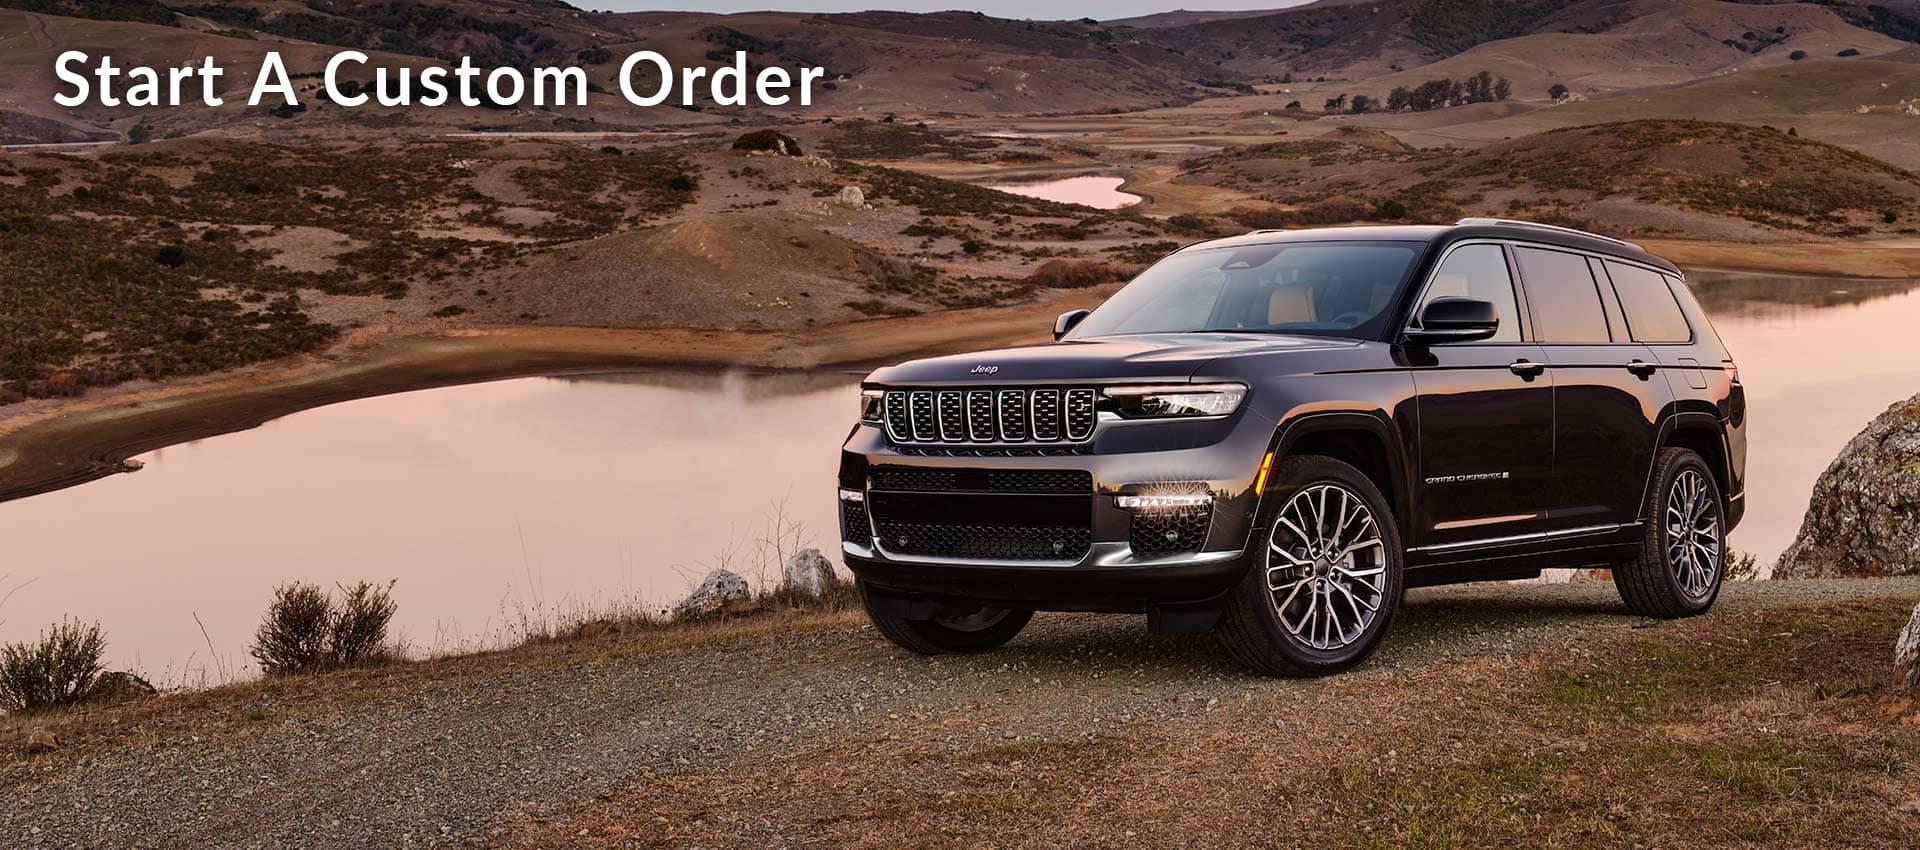 Faricy Chrysler Jeep Dodge Ram - Start A Custom Order in Colorado Springs